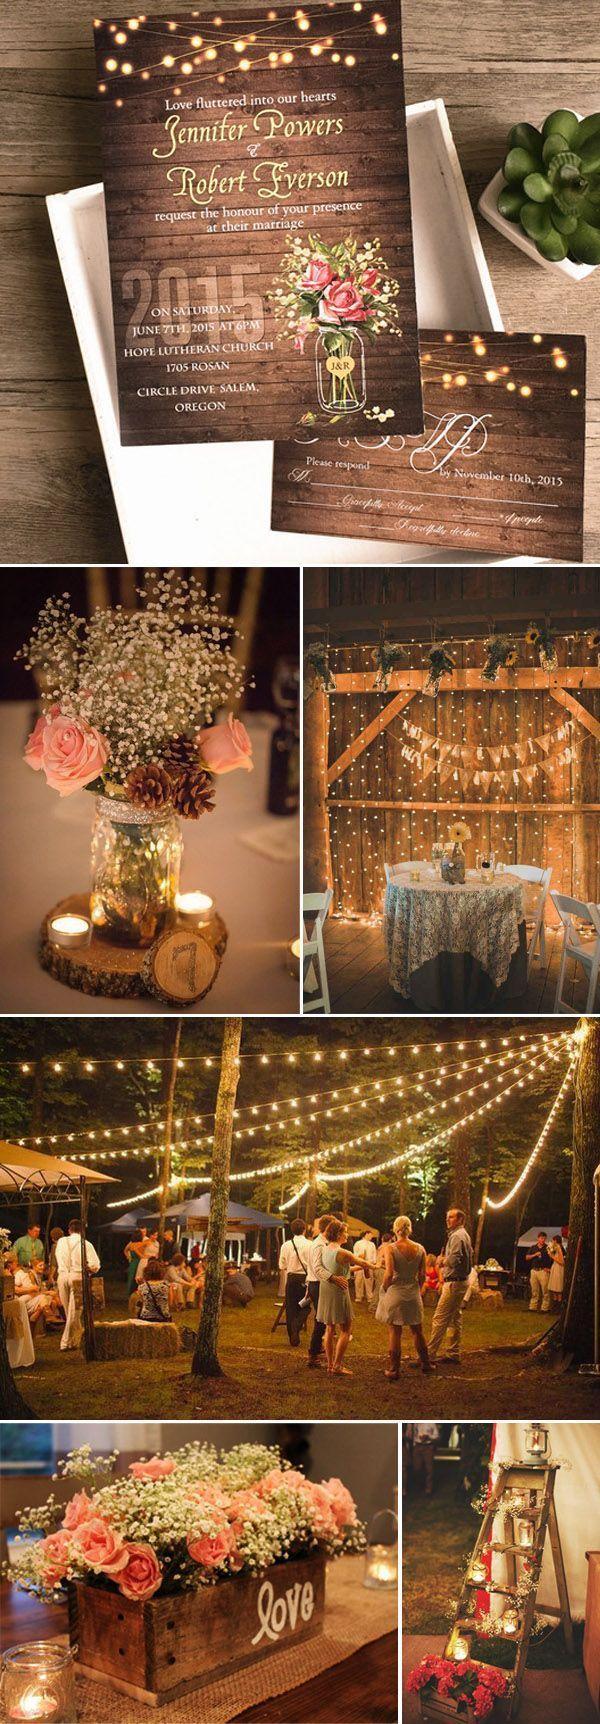 Wedding venue decorations ideas november 2018 This Weeks   Elegant Outdoor Wedding Decorations Minimalist